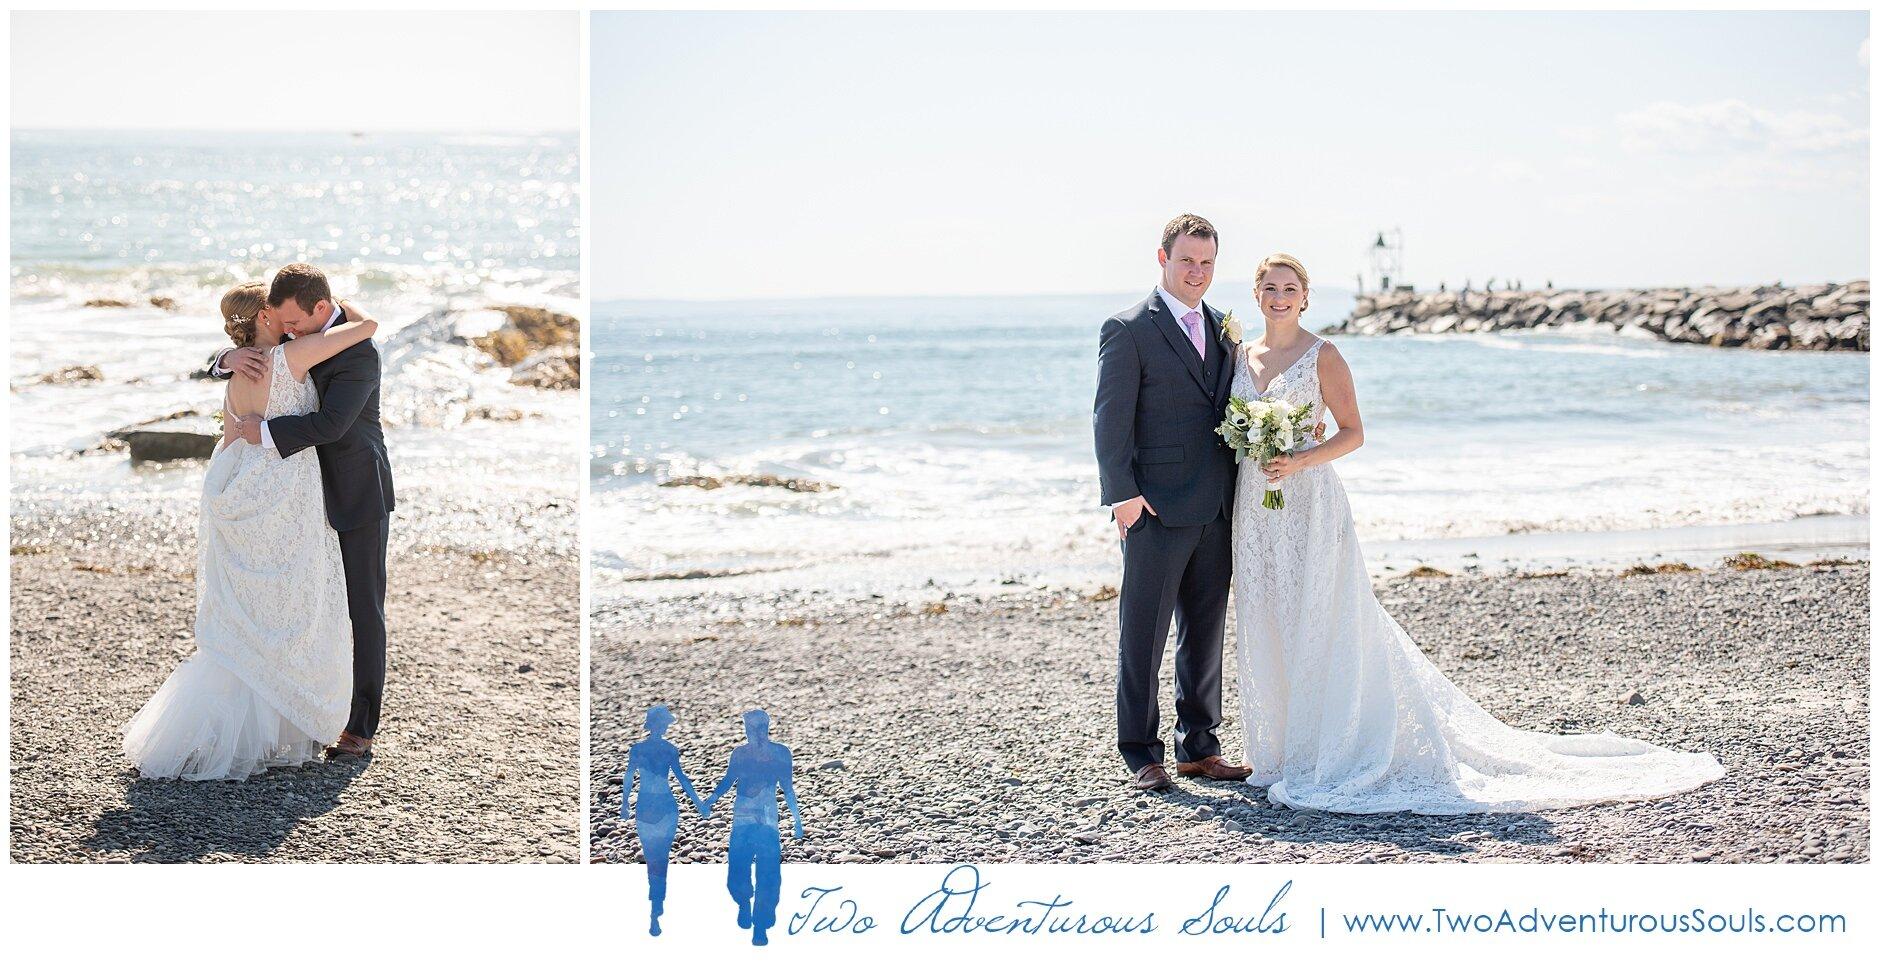 Breakwater Inn and Spa Wedding Photographers, Kennebunkport Wedding Photographers, Two Adventurous Souls- 092119_0016.jpg